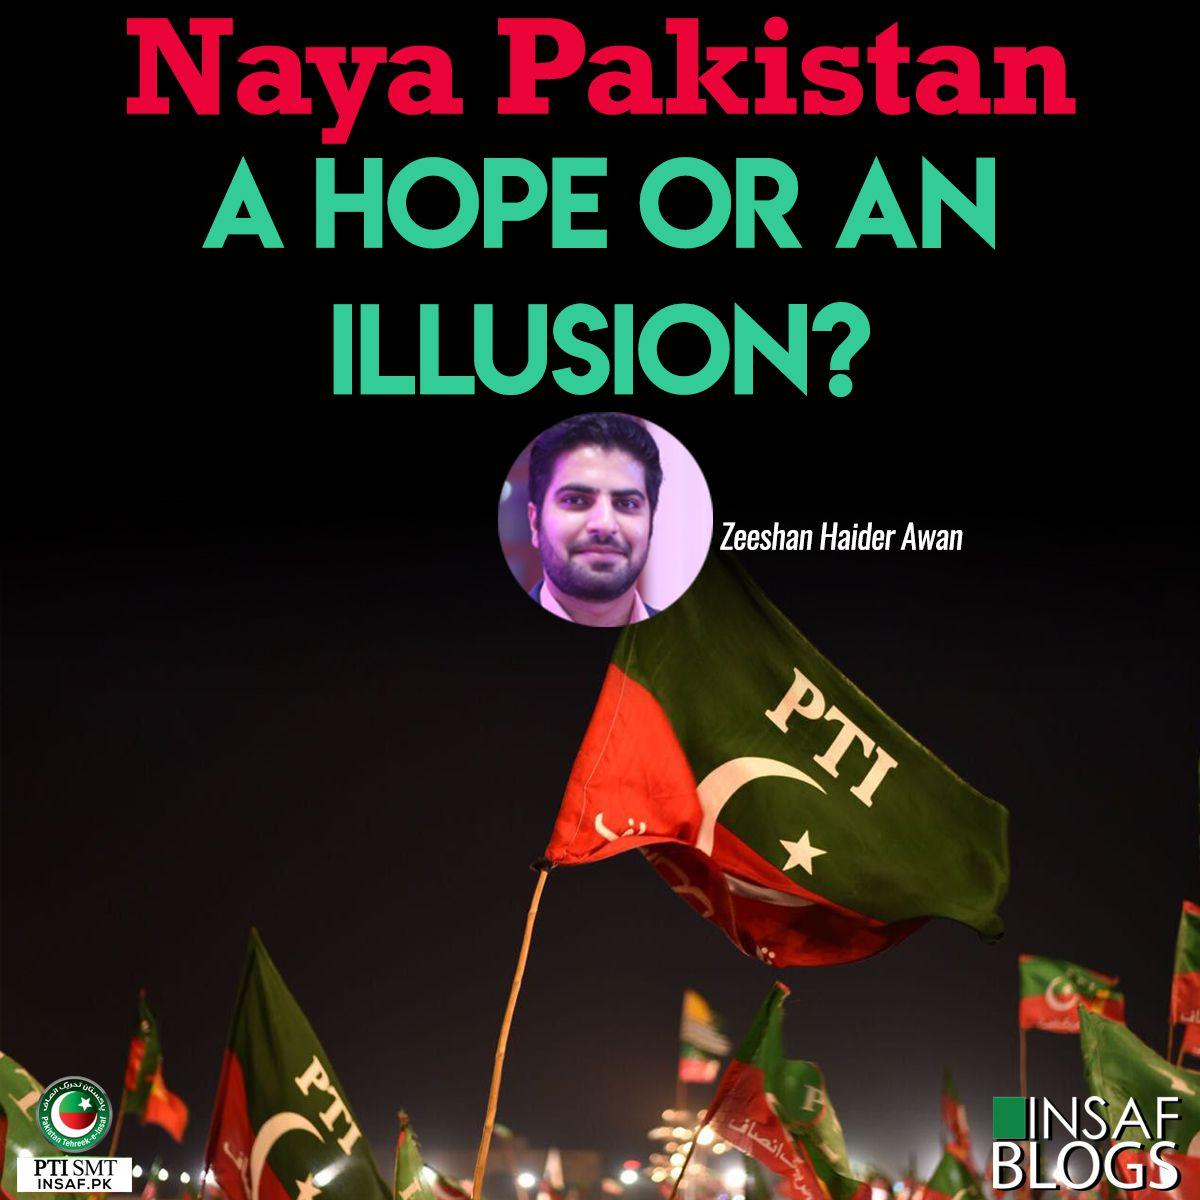 Naya-Pakistan-hope-or-illusion-insaf-blog